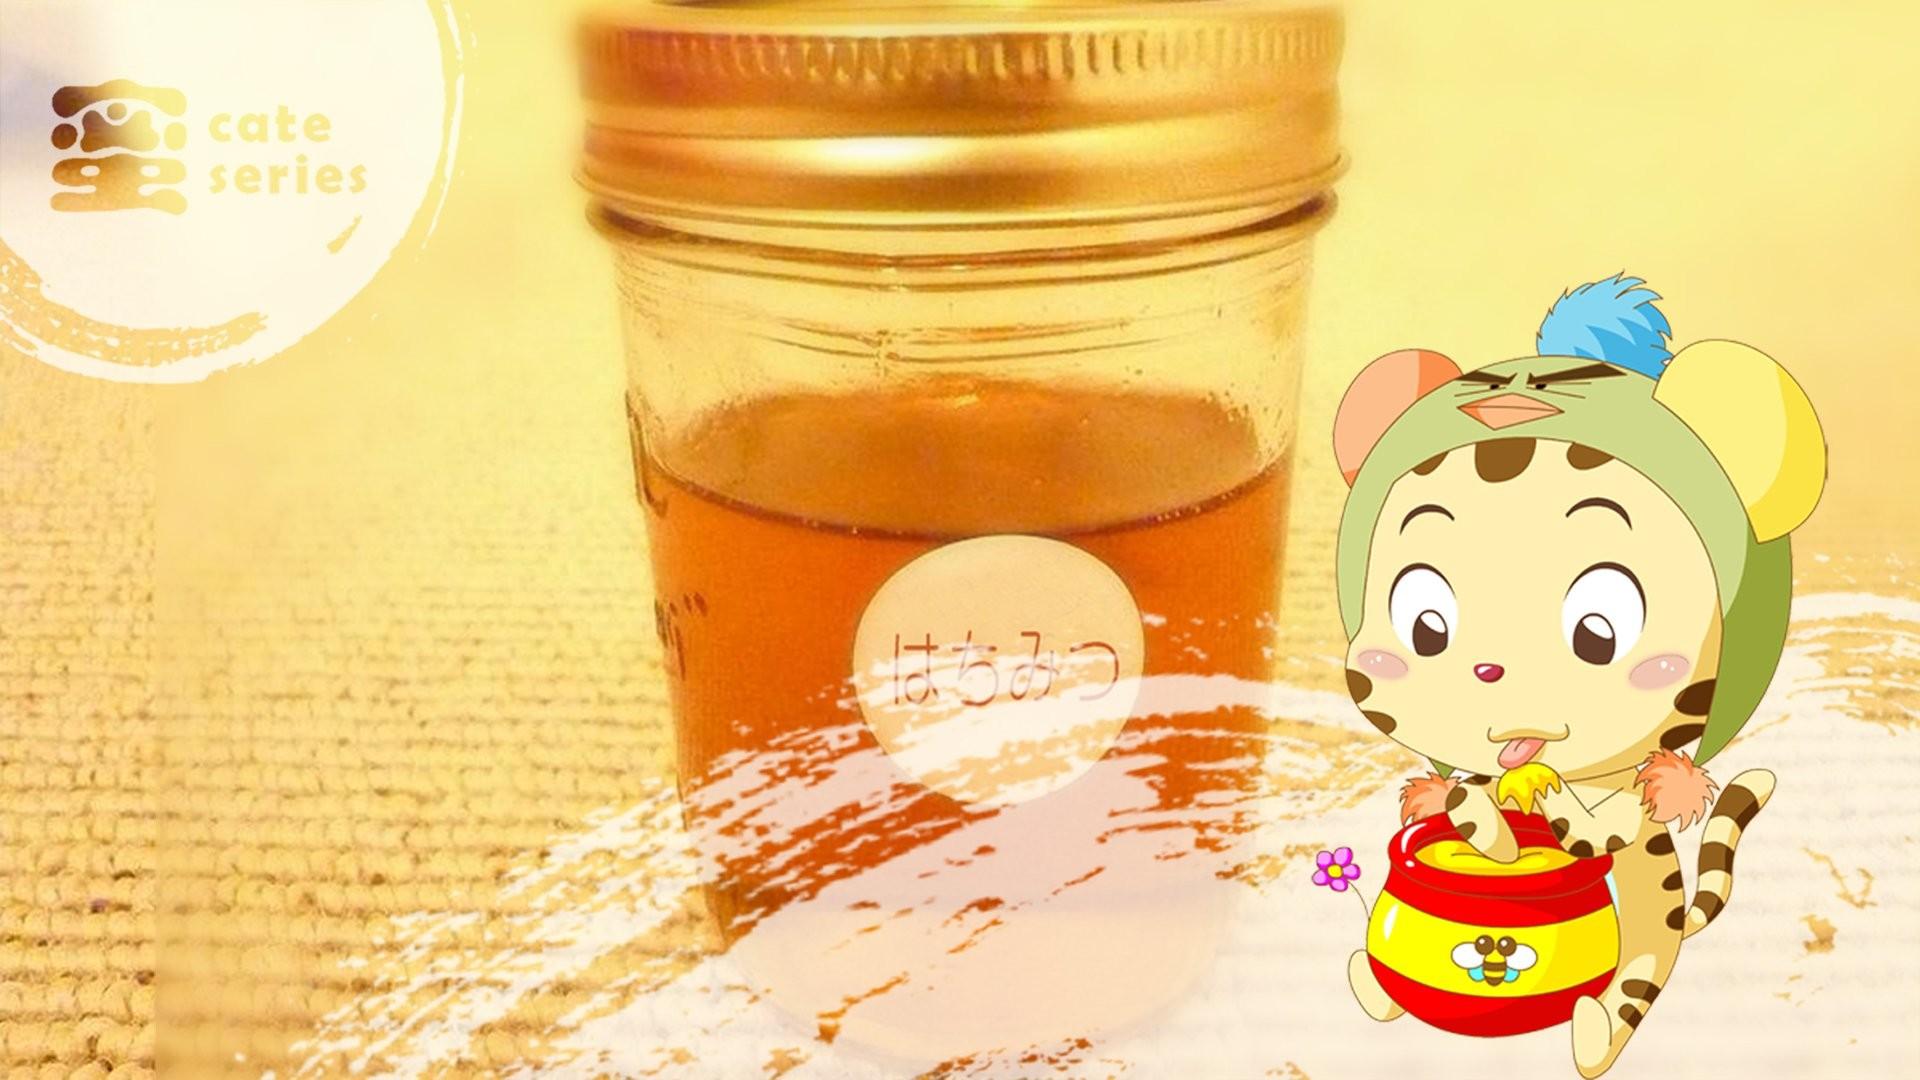 Cute Chinese Cartoon Characters 318138